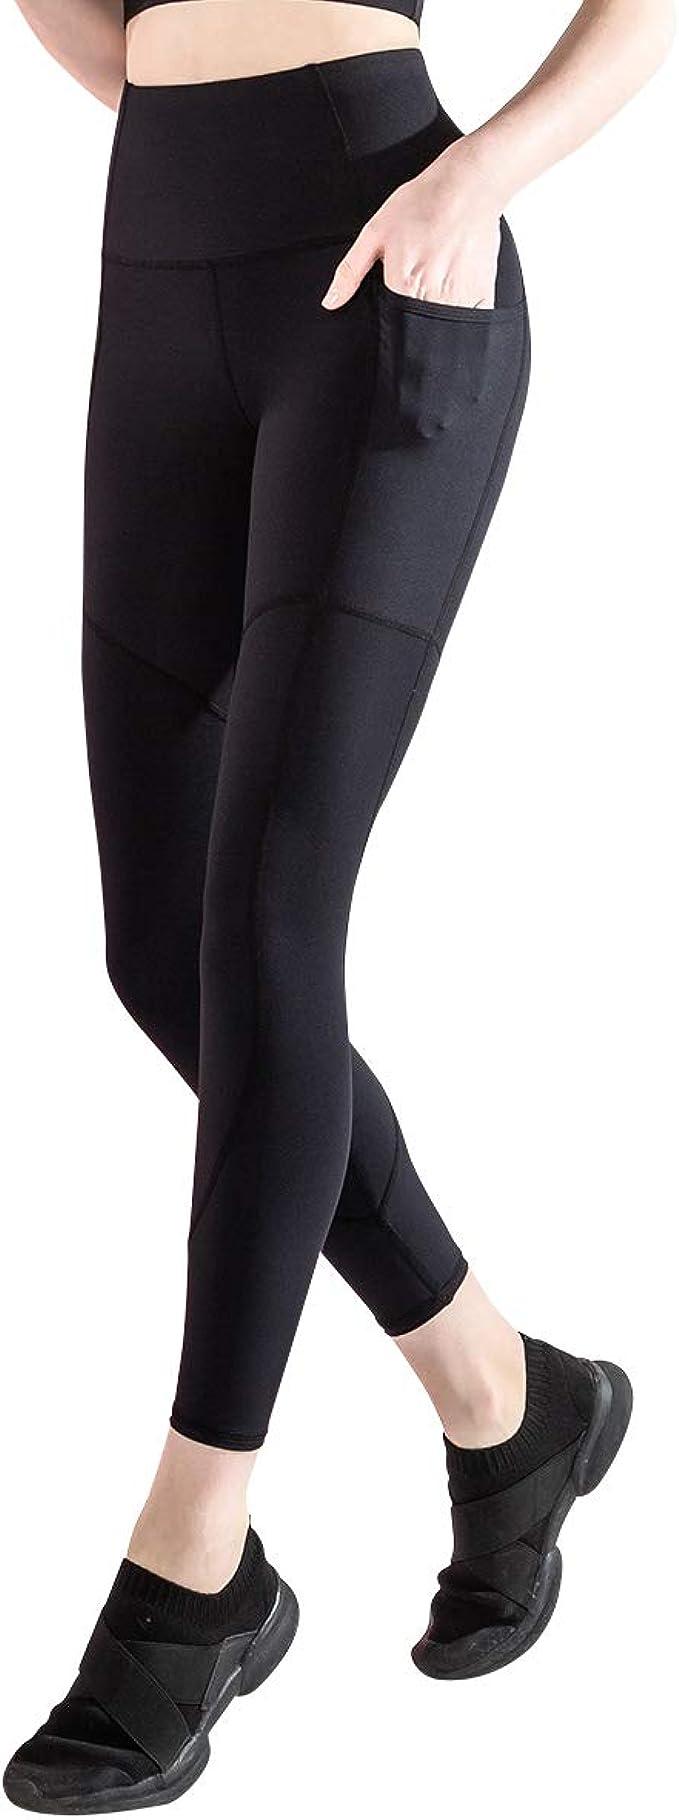 Dizadec Yoga Pants with Pockets,High Waist Yoga Pants with Pockets Workout Yoga Leggings for Women